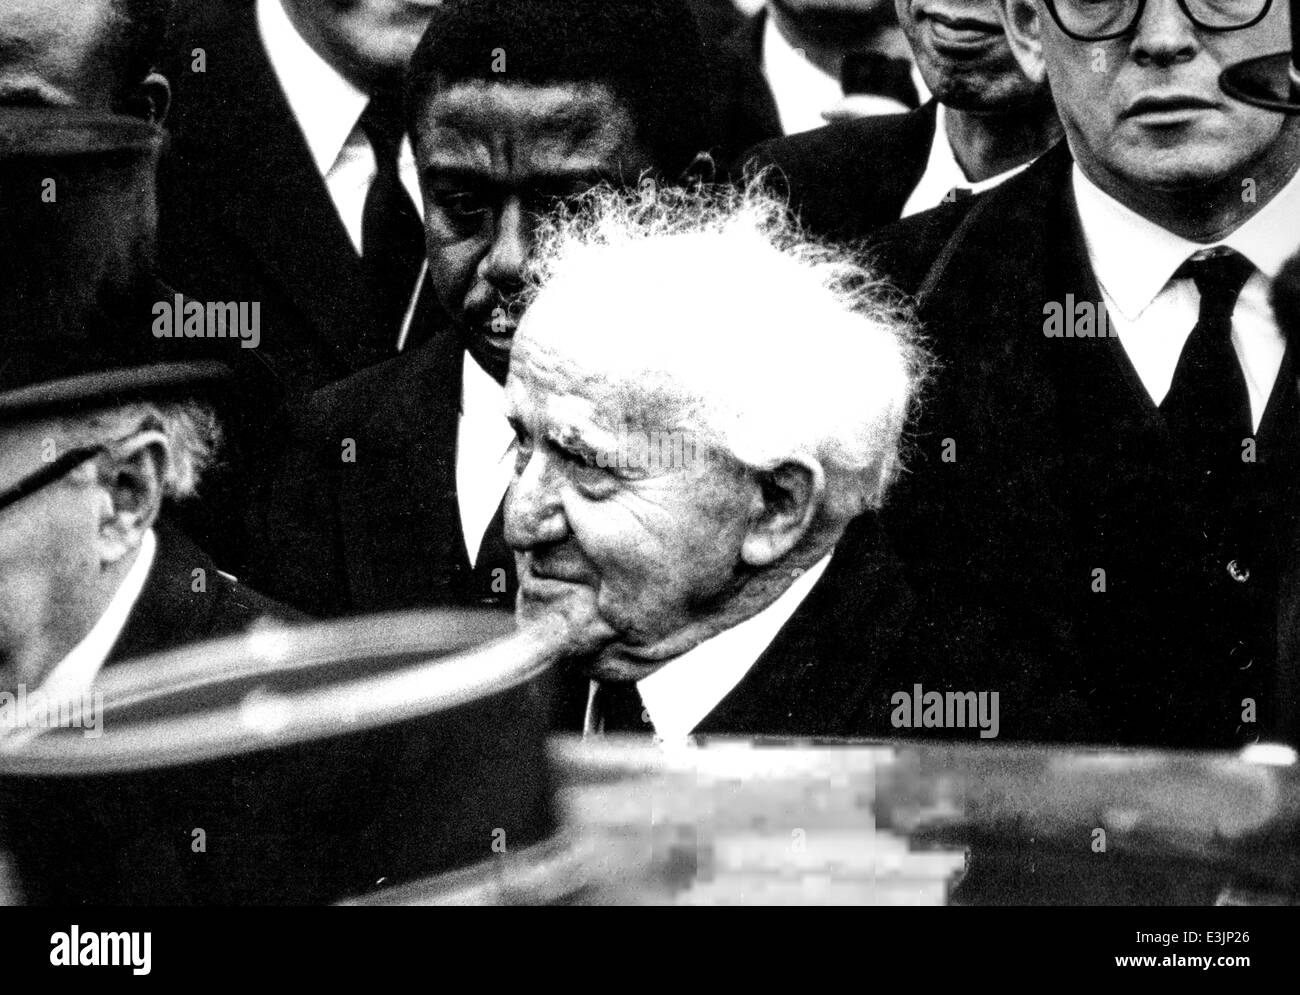 ben gurion at charles de gaulle's funeral rite,1970 - Stock Image